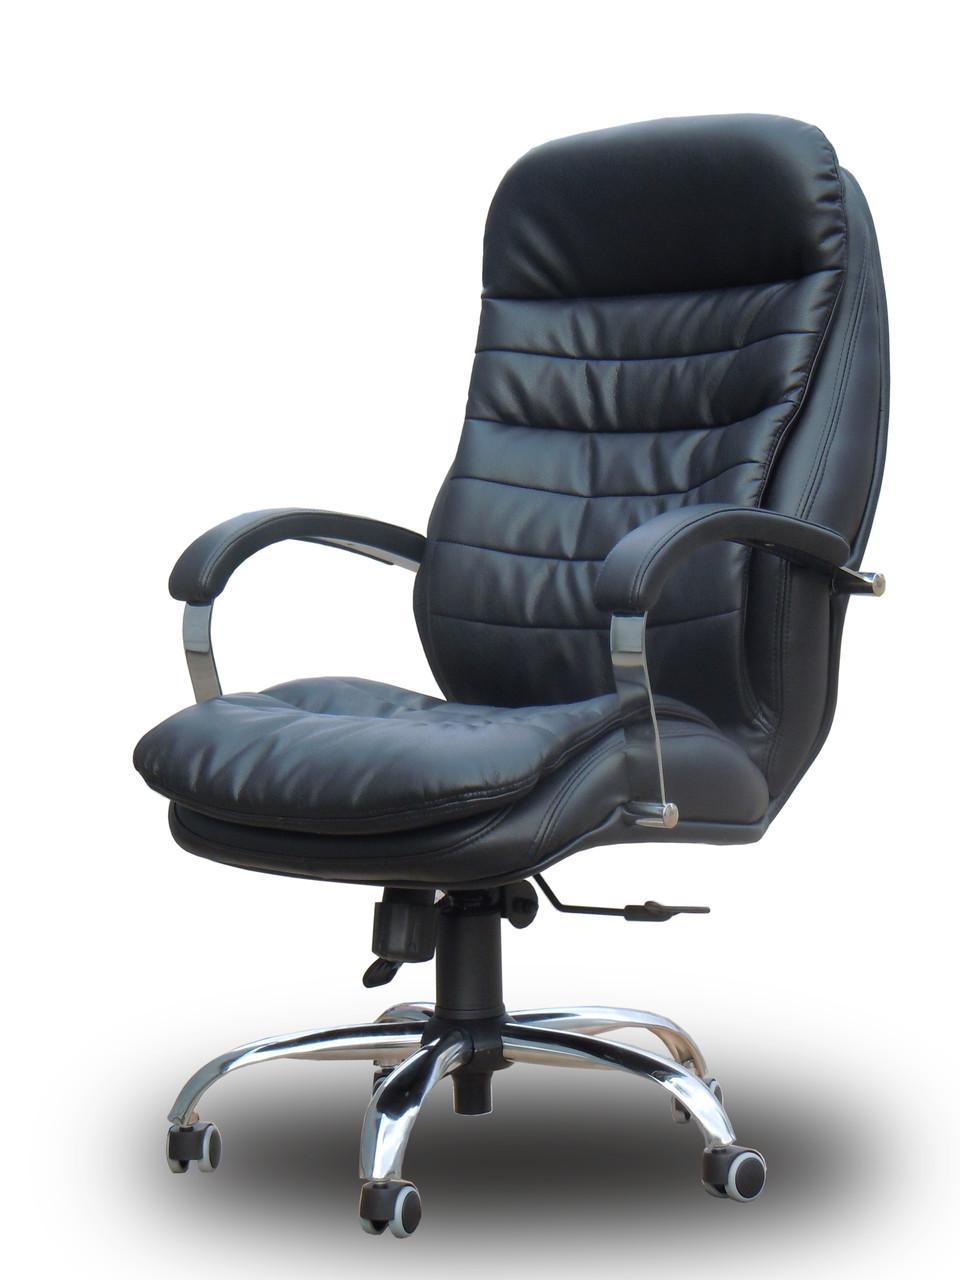 Кресло Валенсия Хром HB/ Valencia Chrome купить